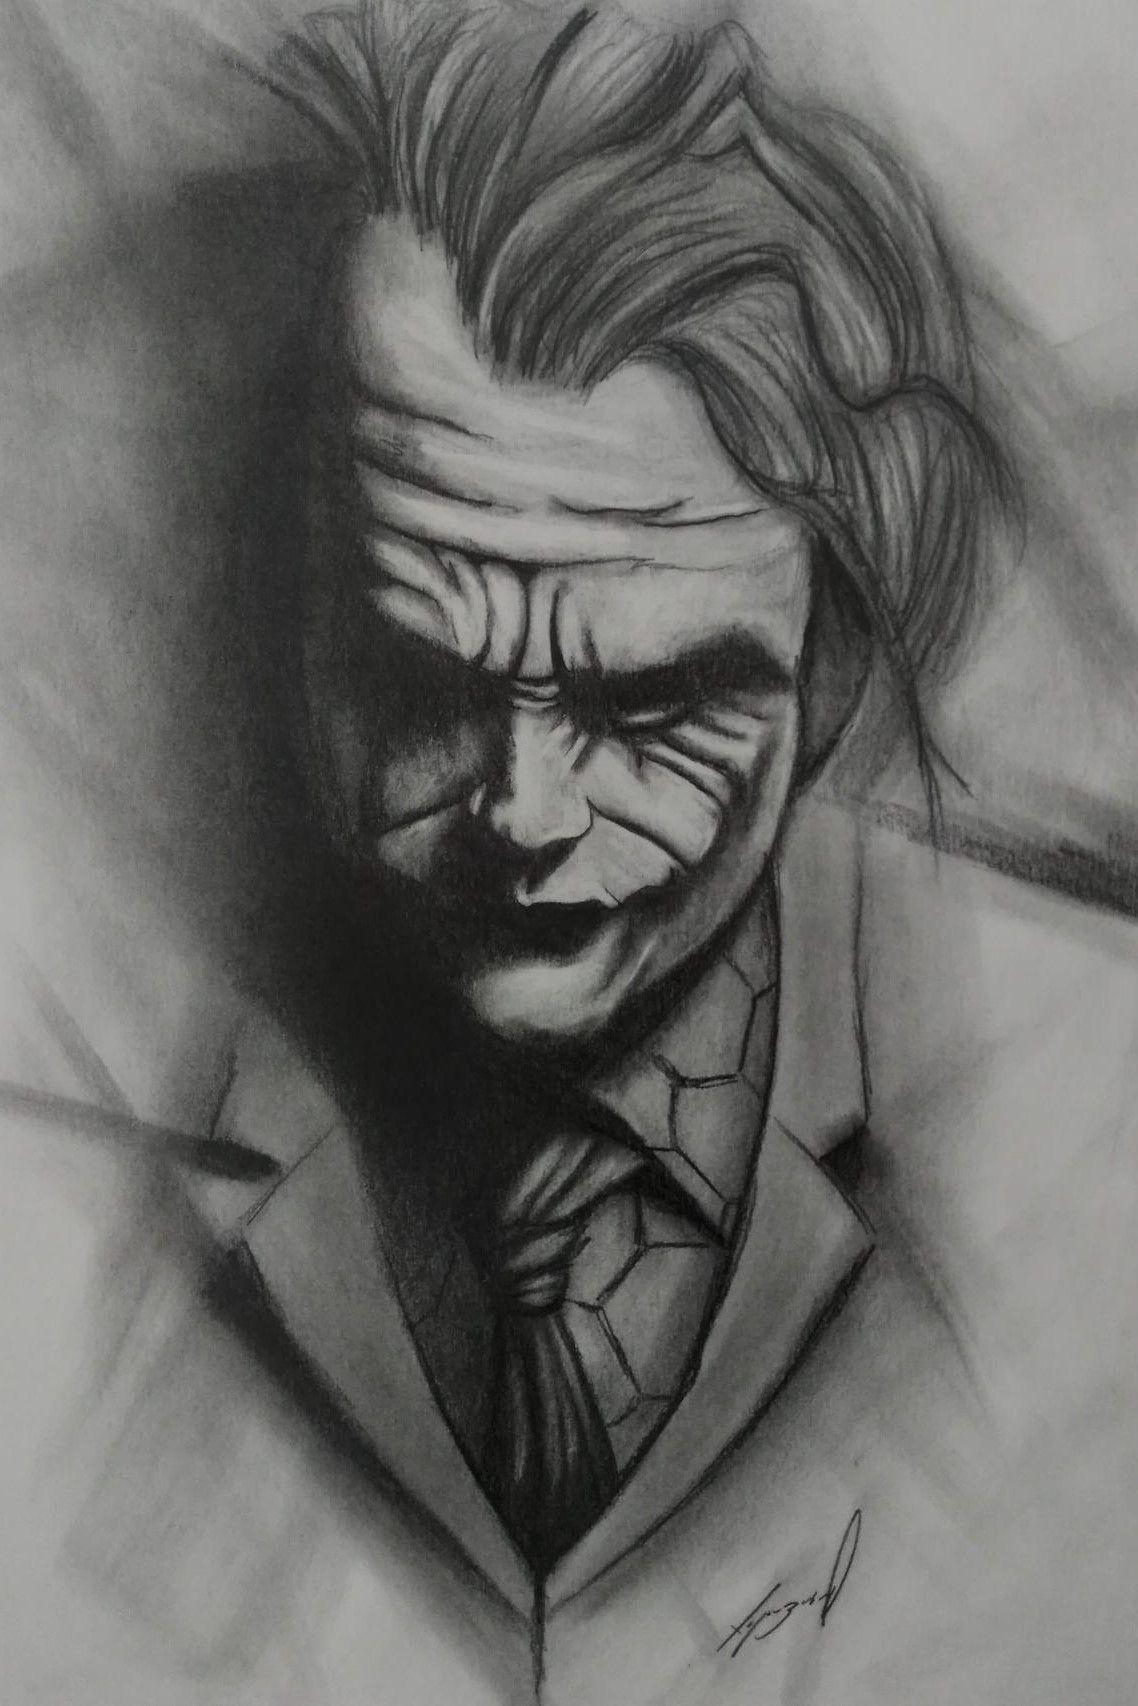 The Joker Pencil Drawing By Morkedin On Deviant Art